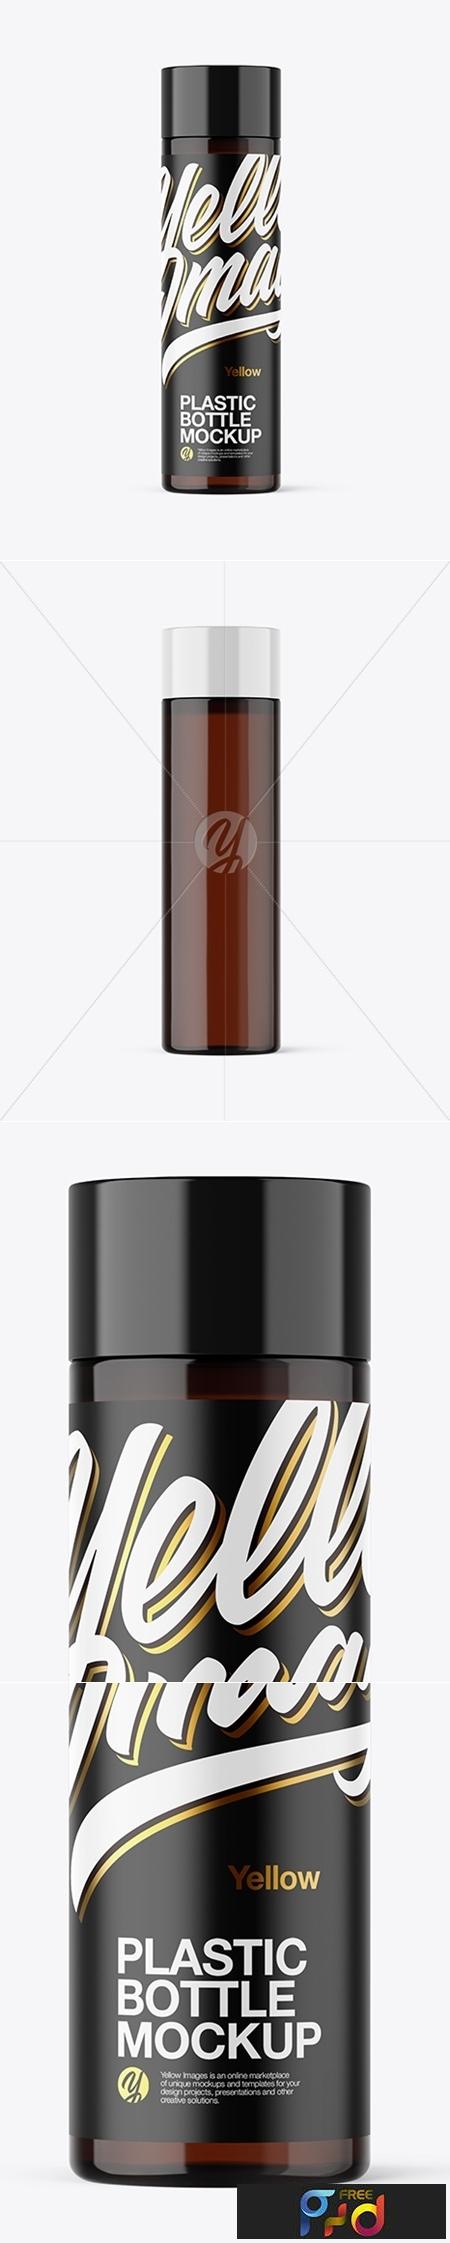 Amber Plastic Bottle Mockup 42748 1